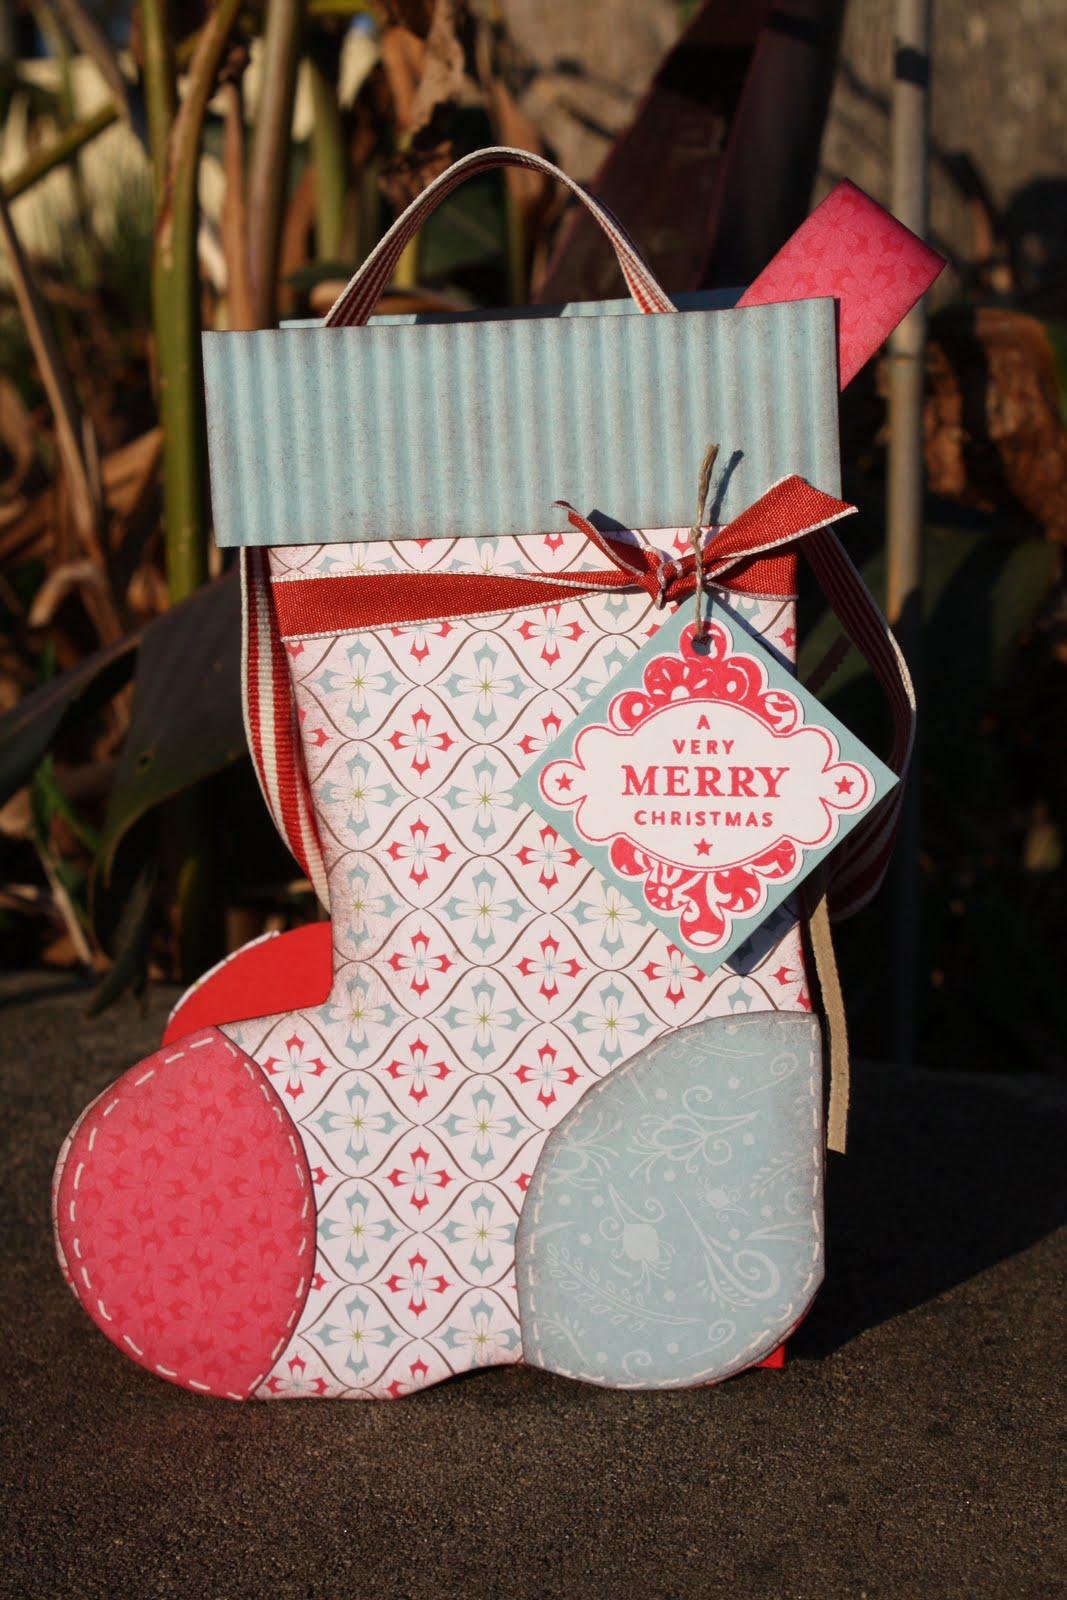 [stocking]